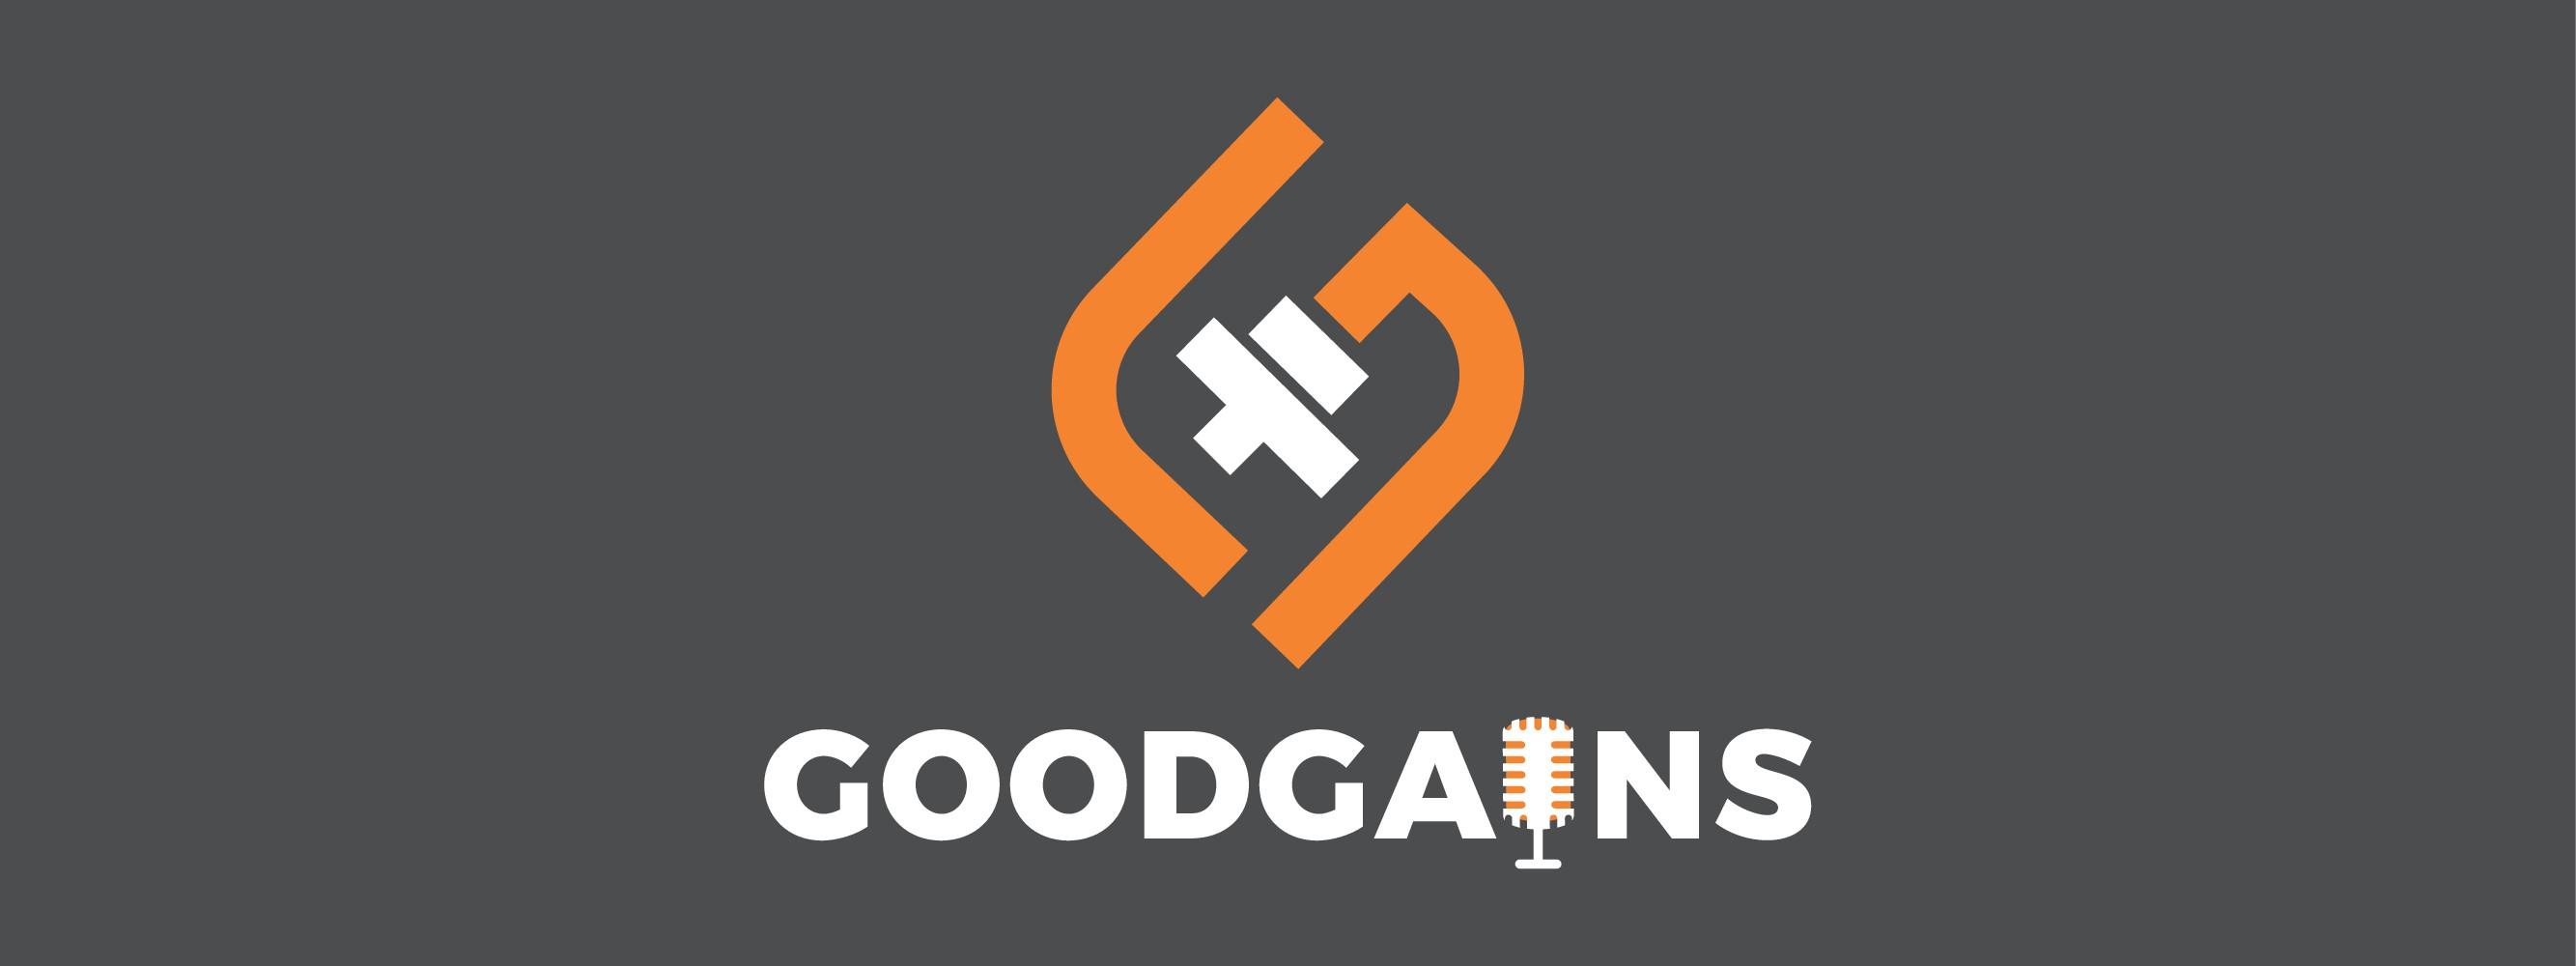 Fitness content website needs a cool logo